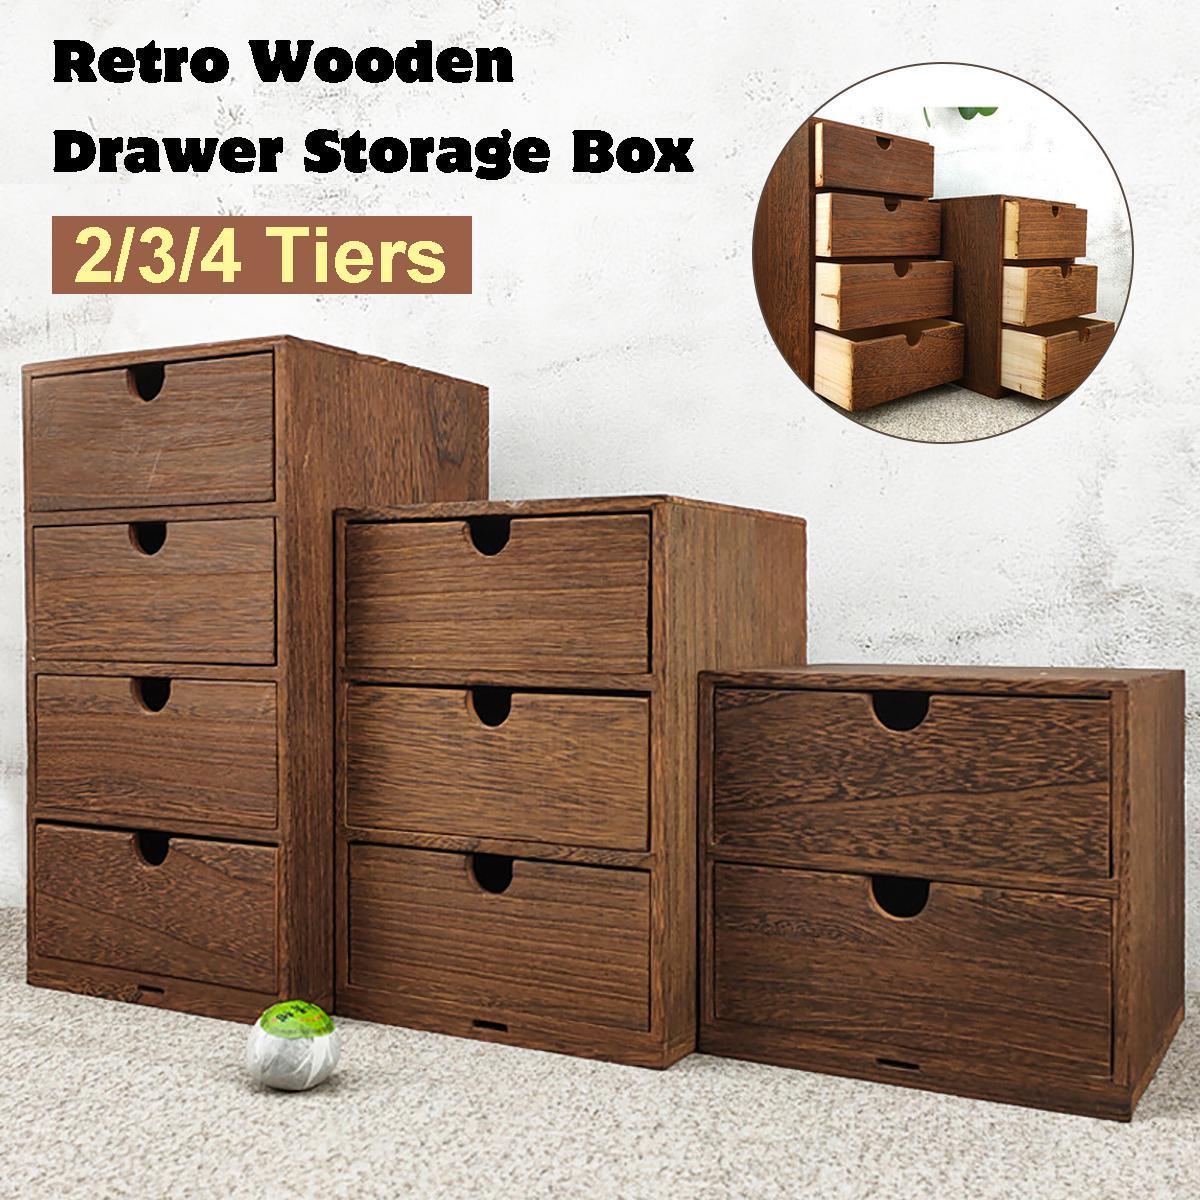 drawer wooden storage organizer small desktop decorative cabinet boxes 4 tiers 18x18x33cm